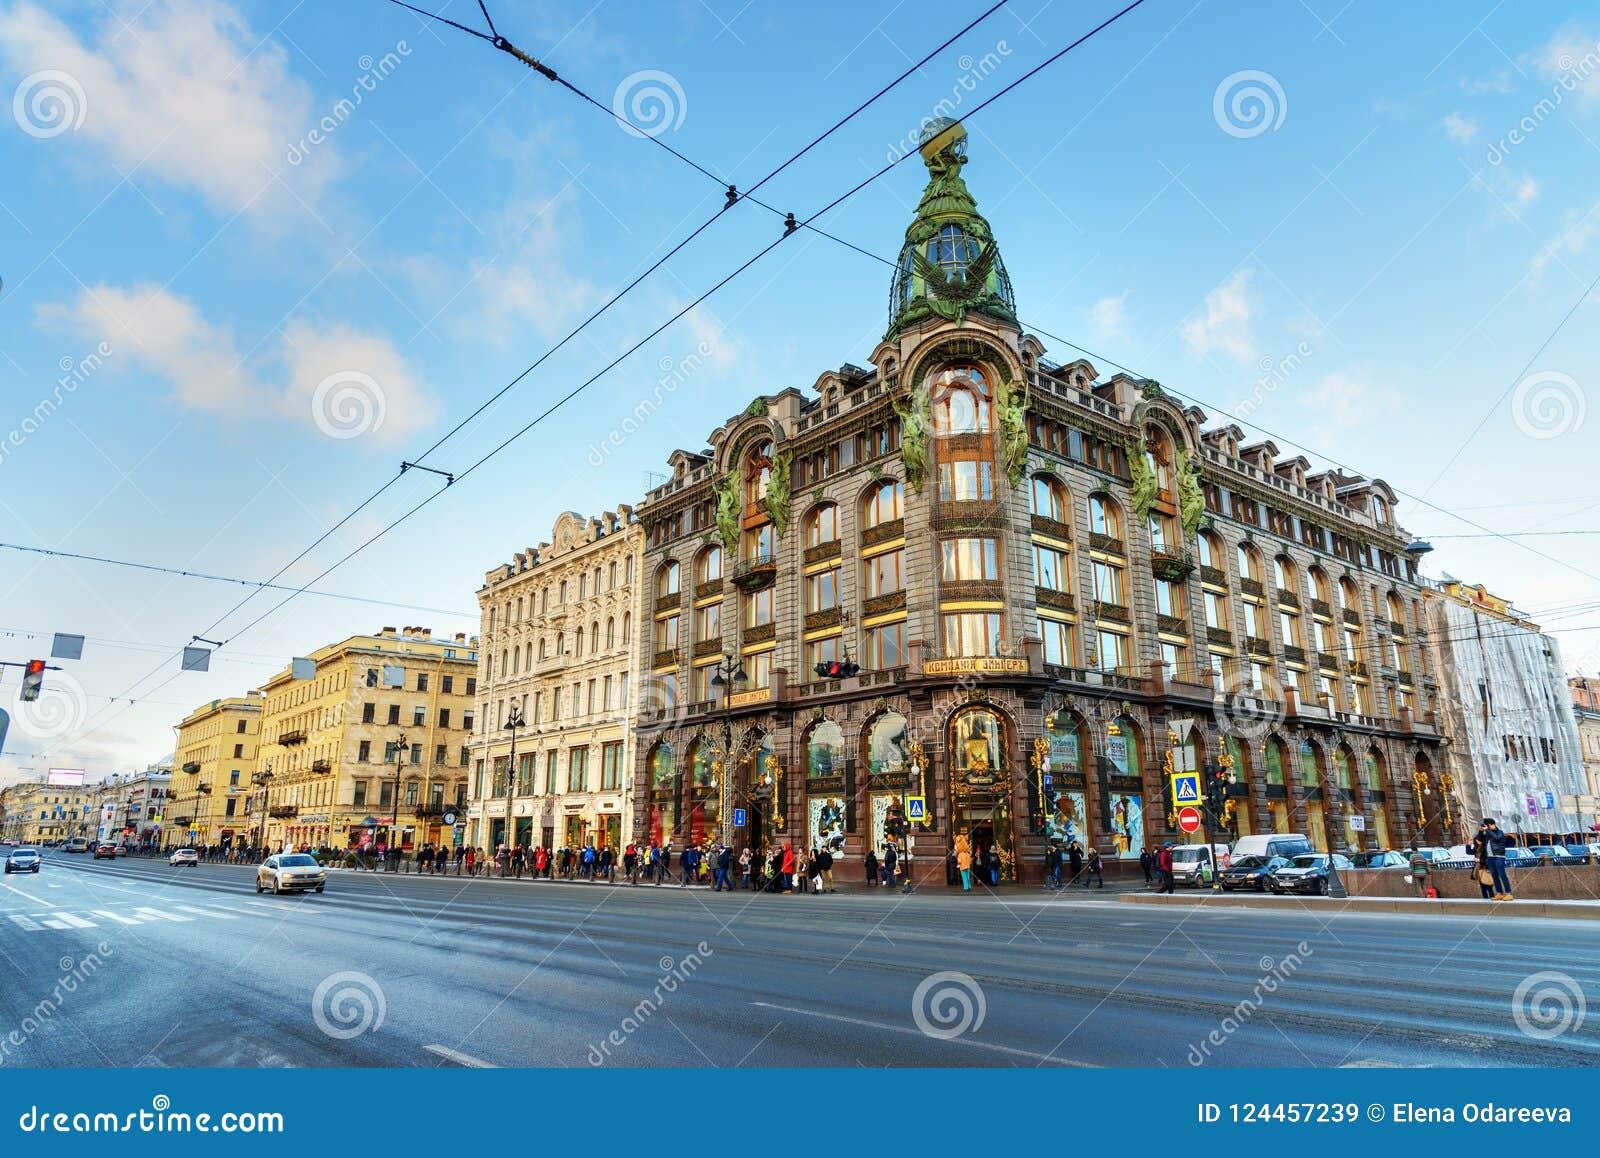 Singer House Or Singer Company Buildingon On Nevsky Prospekt